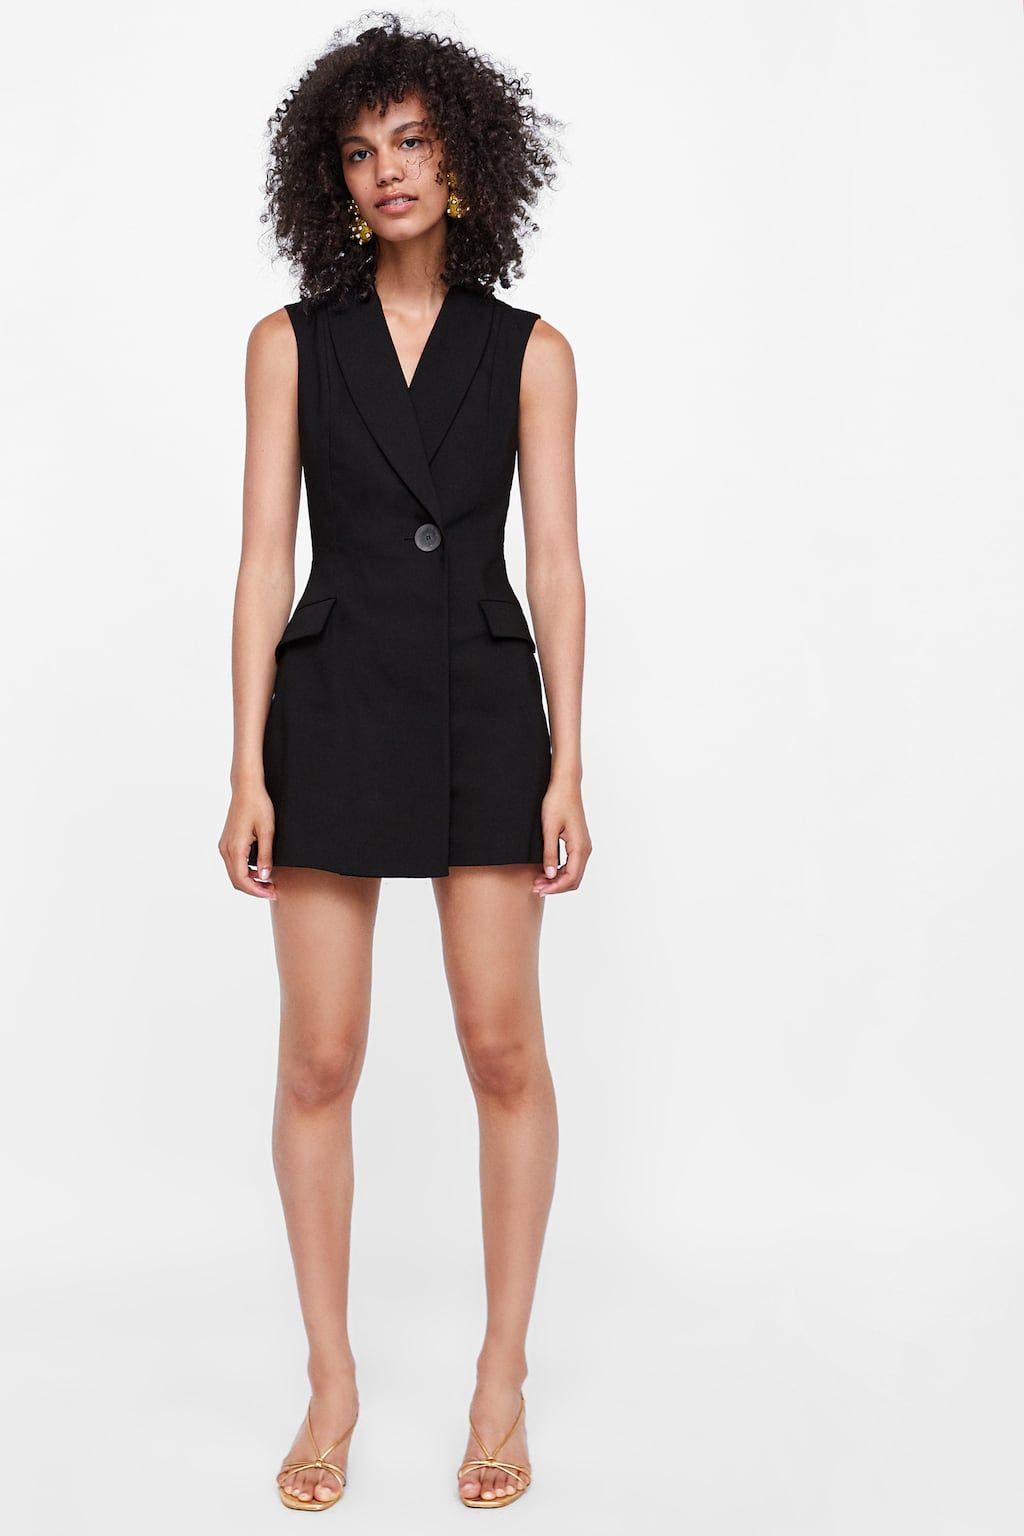 zara - sale - lace lapel jumpsuit | kleines schwarzes kleid